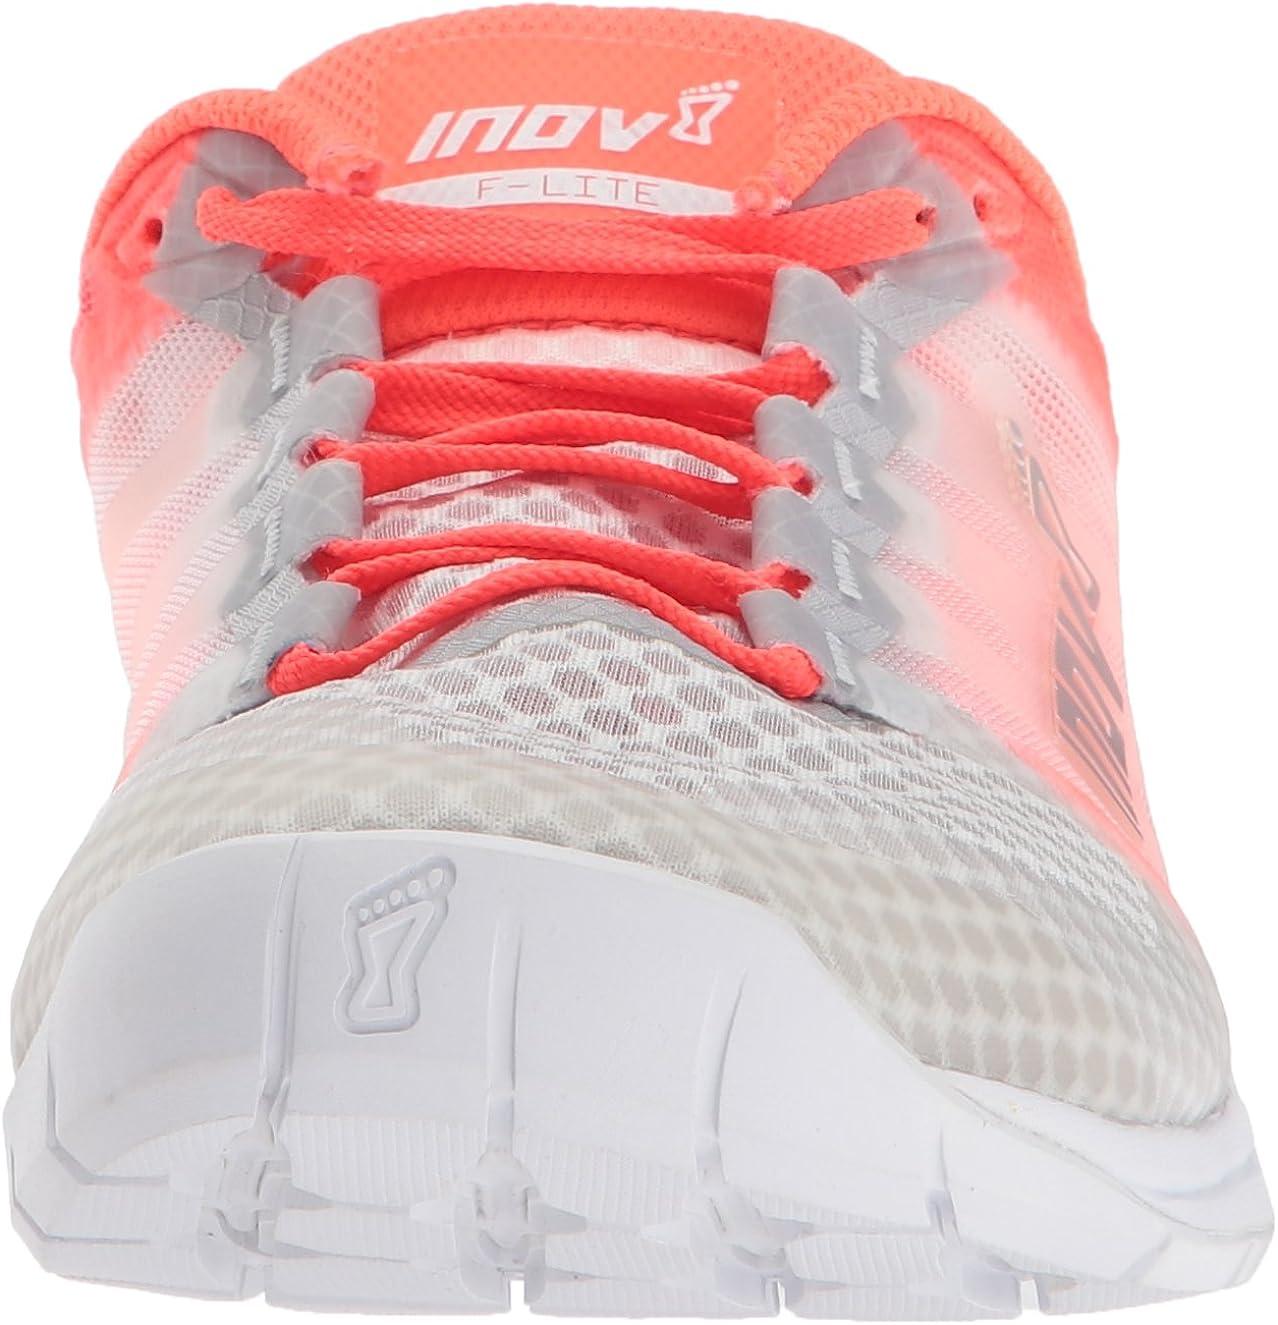 Inov8 F-Lite 235 V2 Chill Womens Chaussure De Course /à Pied